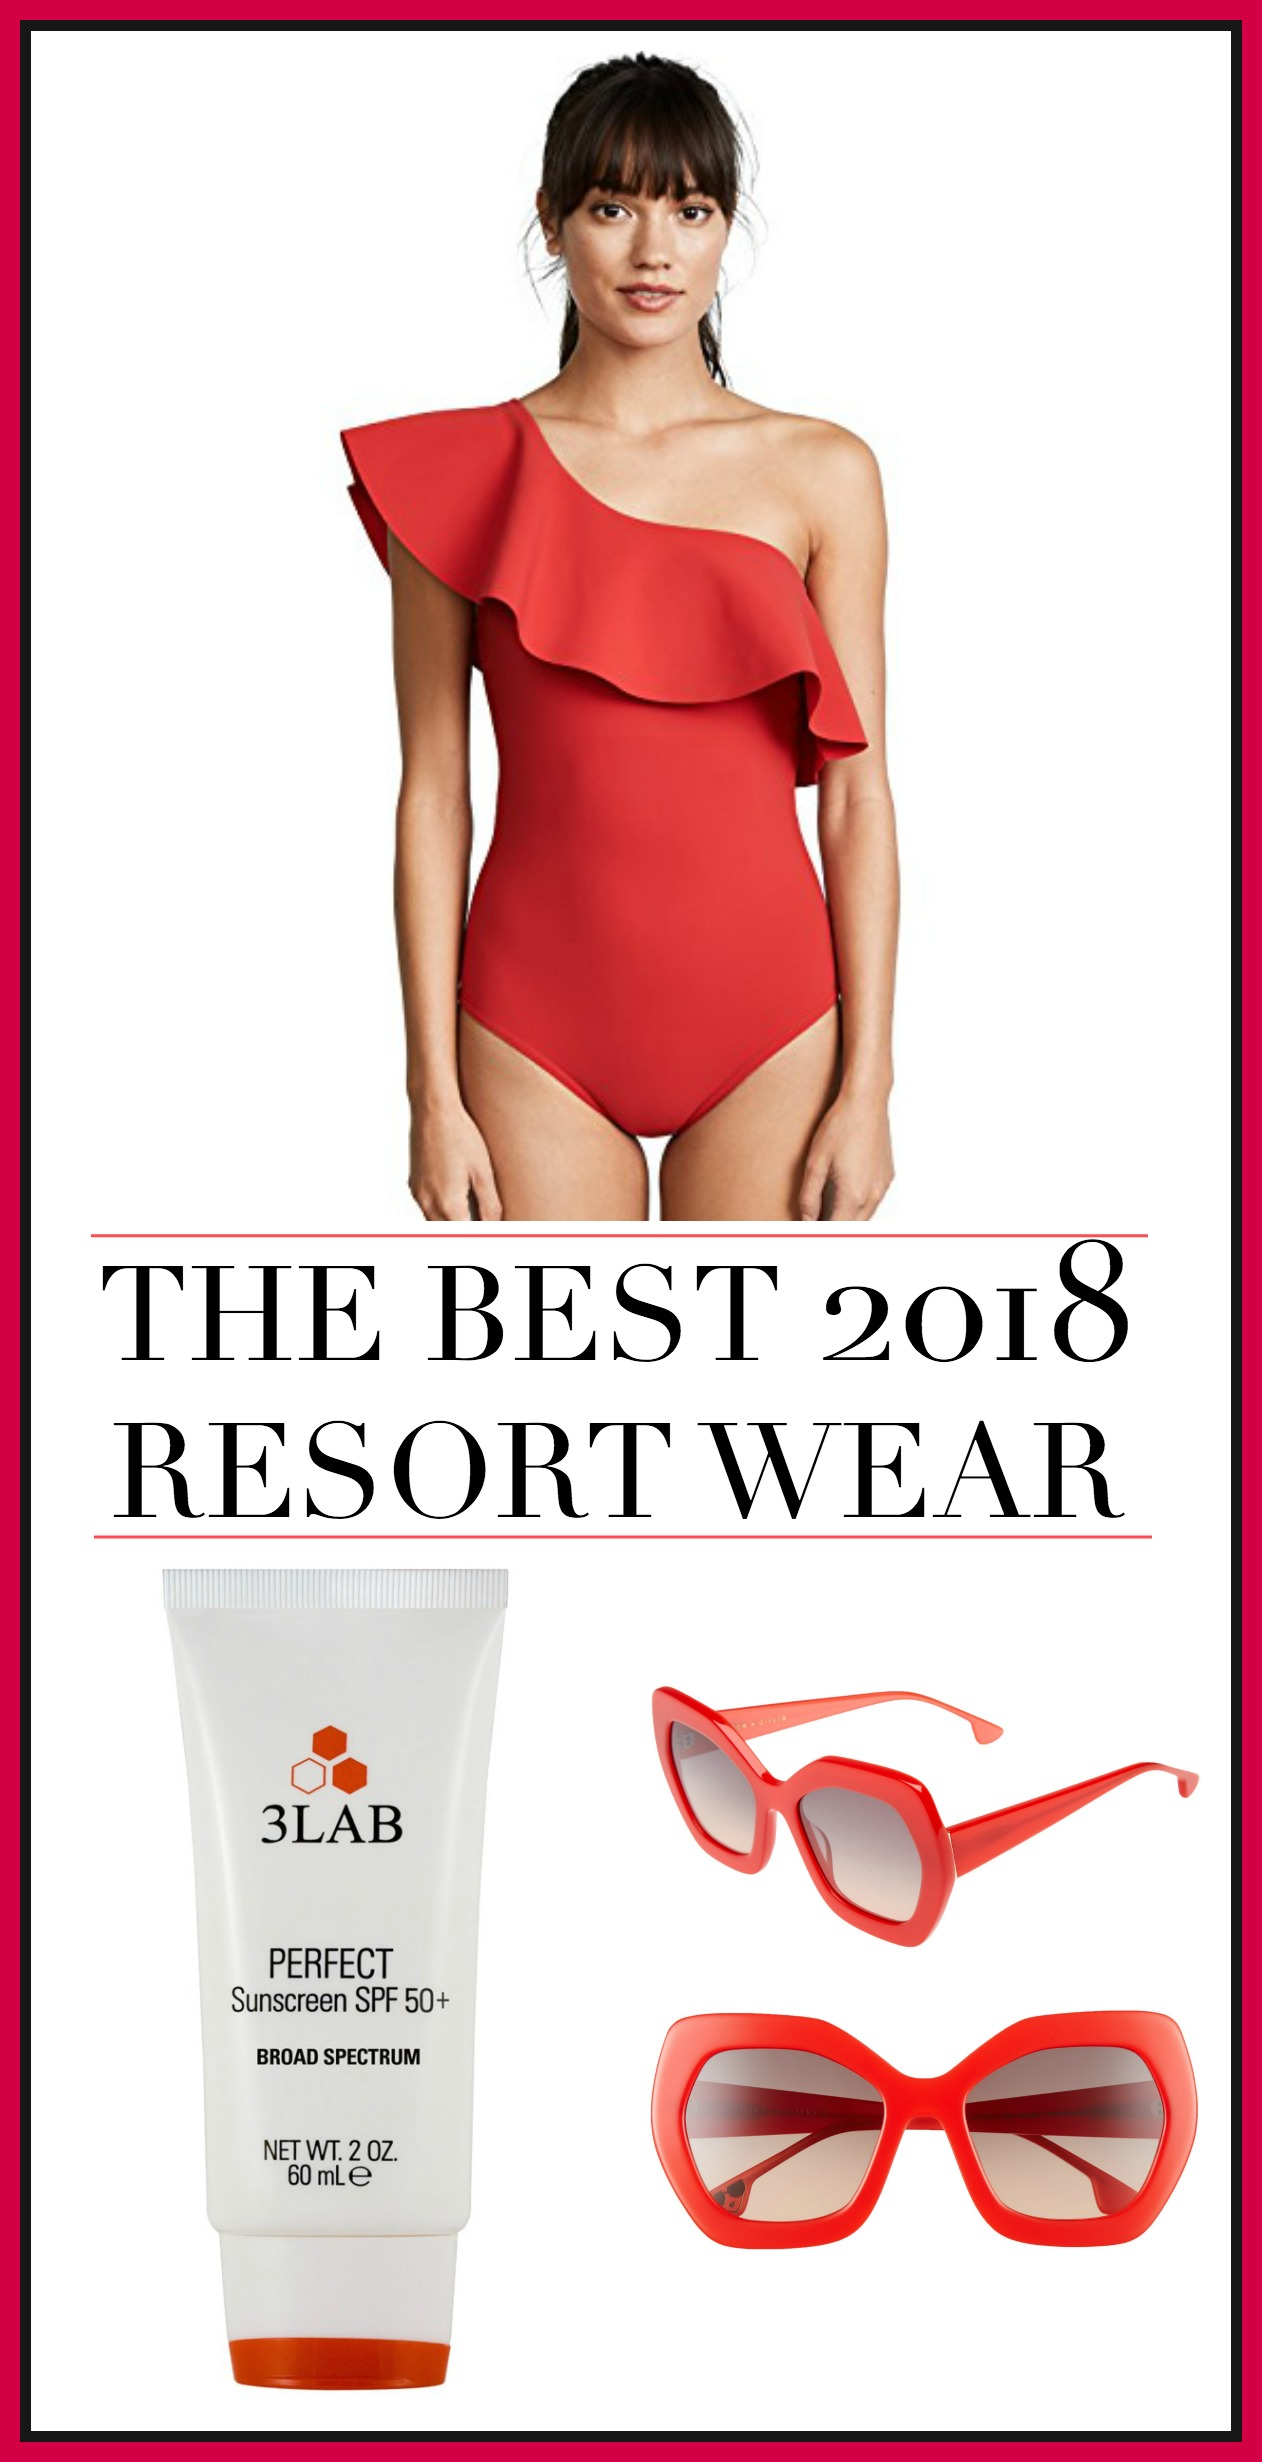 best resort wear, top resort wear, resort wear 2018, summer 2018, summer fashion, summer trends